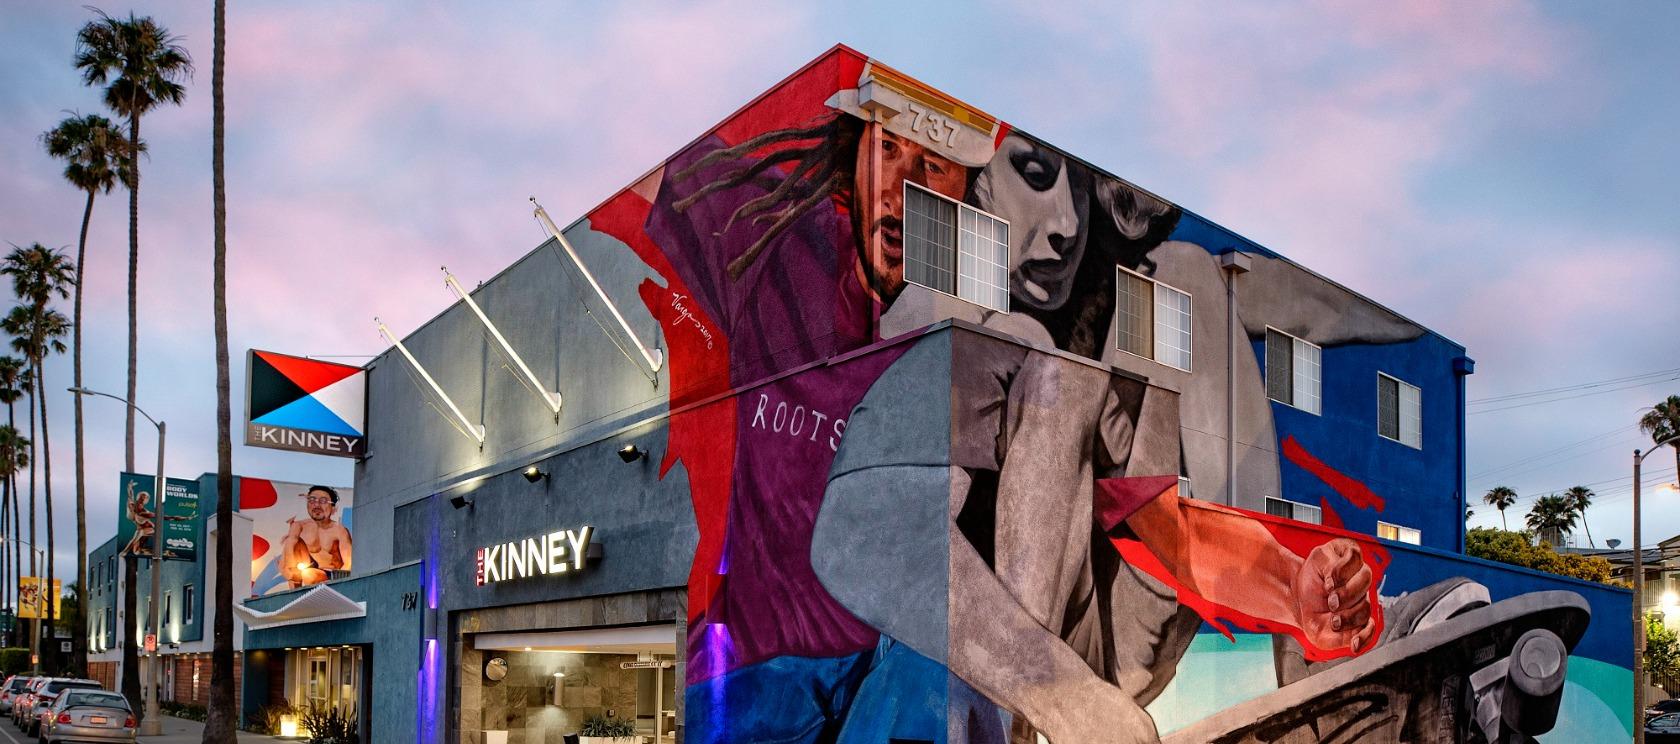 Kinney Hotel Exterior